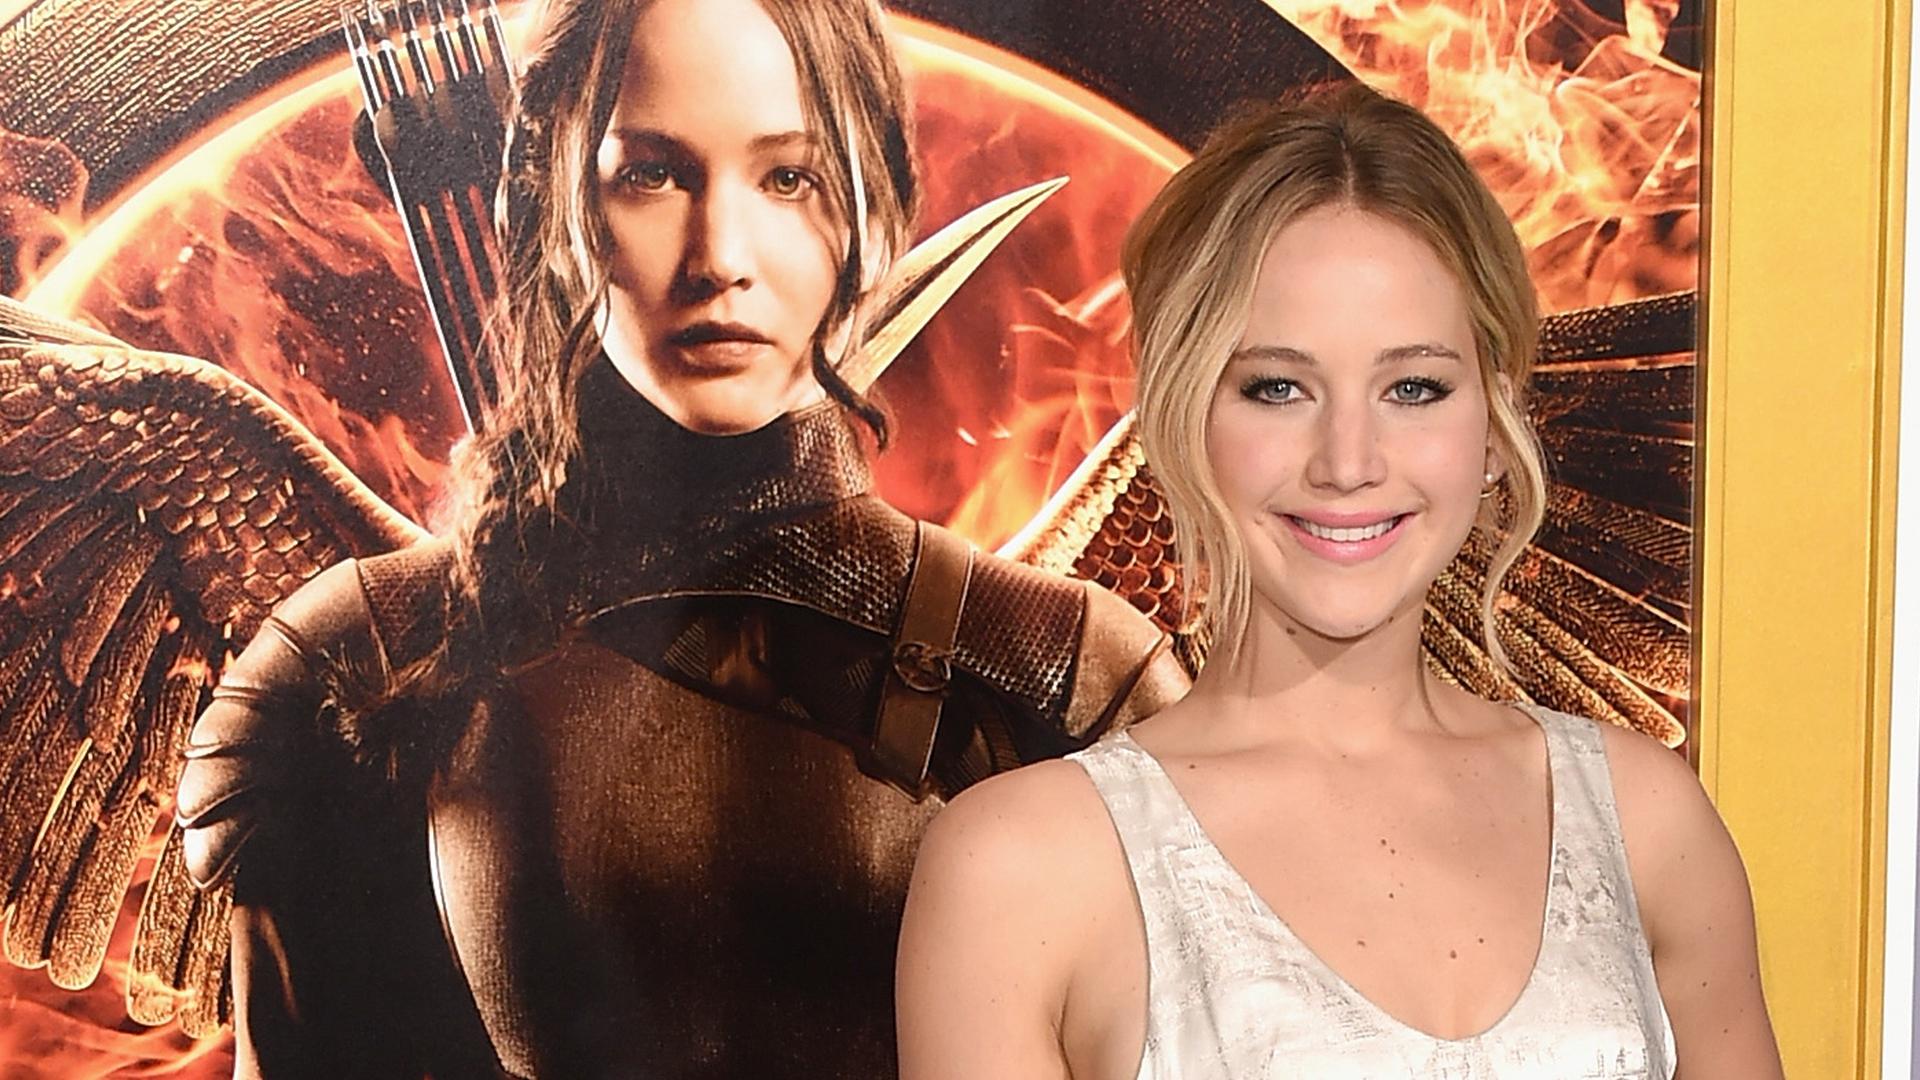 'Hanging Tree' de Jennifer Lawrence en camino a su debut en la cartelera Hot 100